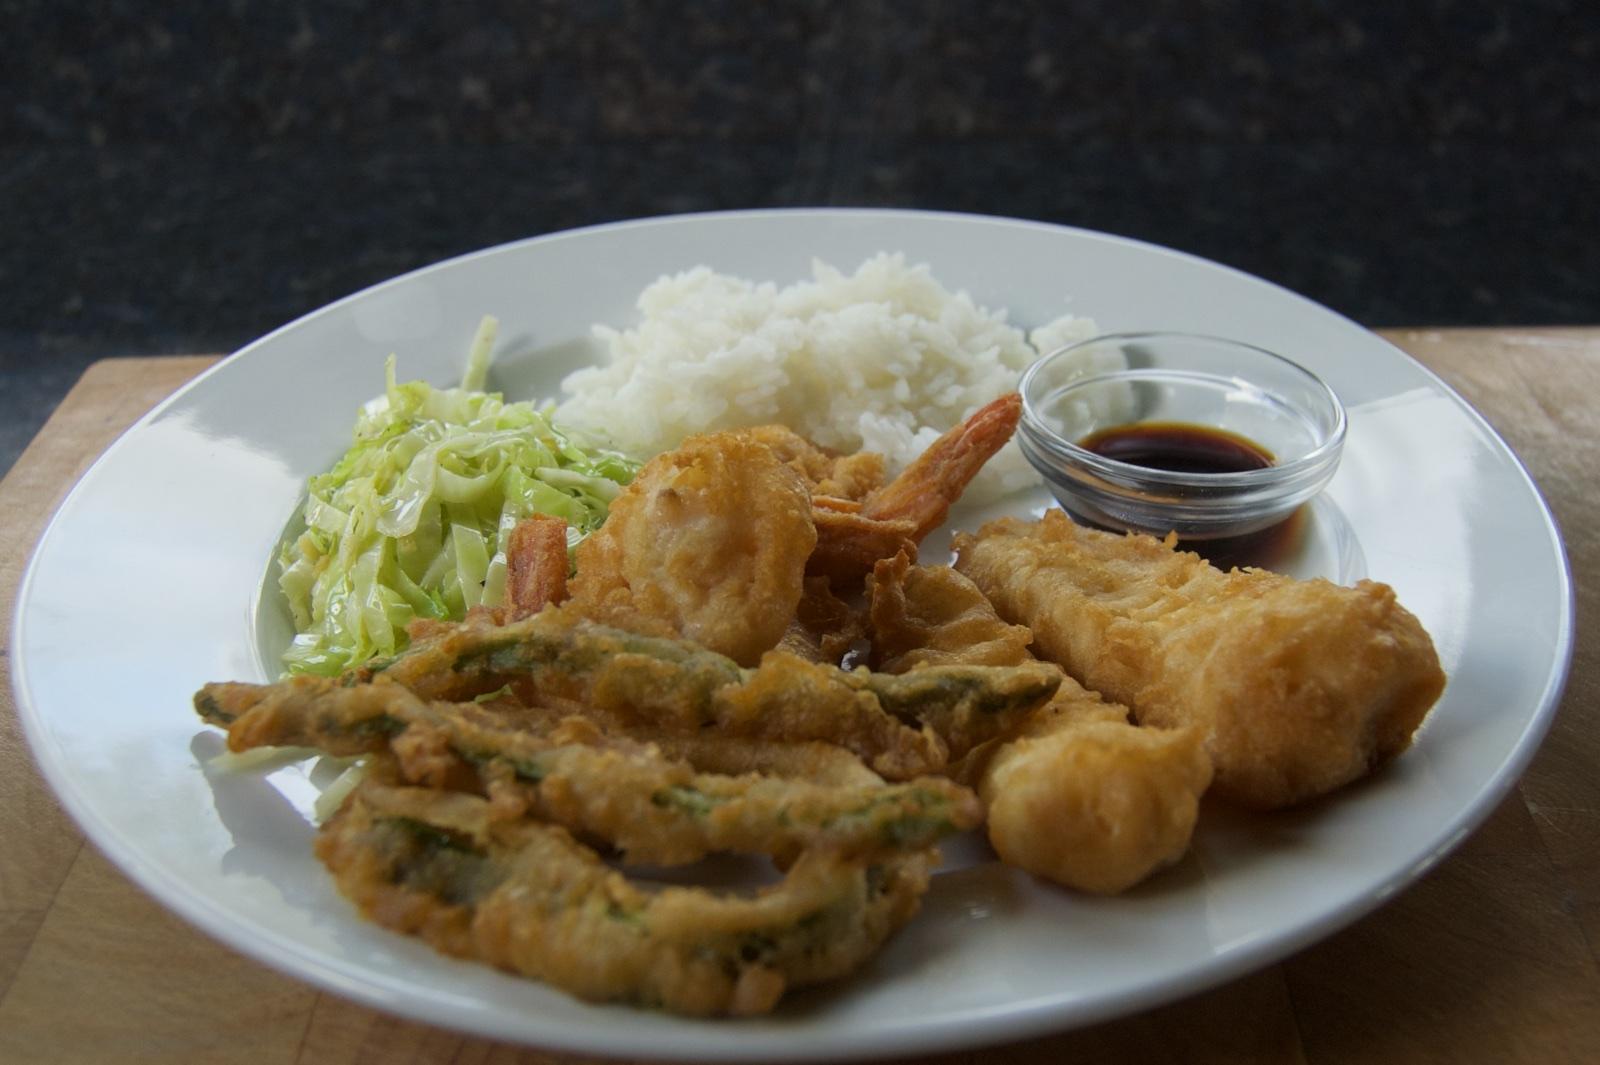 http://blog.rickk.com/food/2015/10/08/ate.2015.10.07.d.jpg